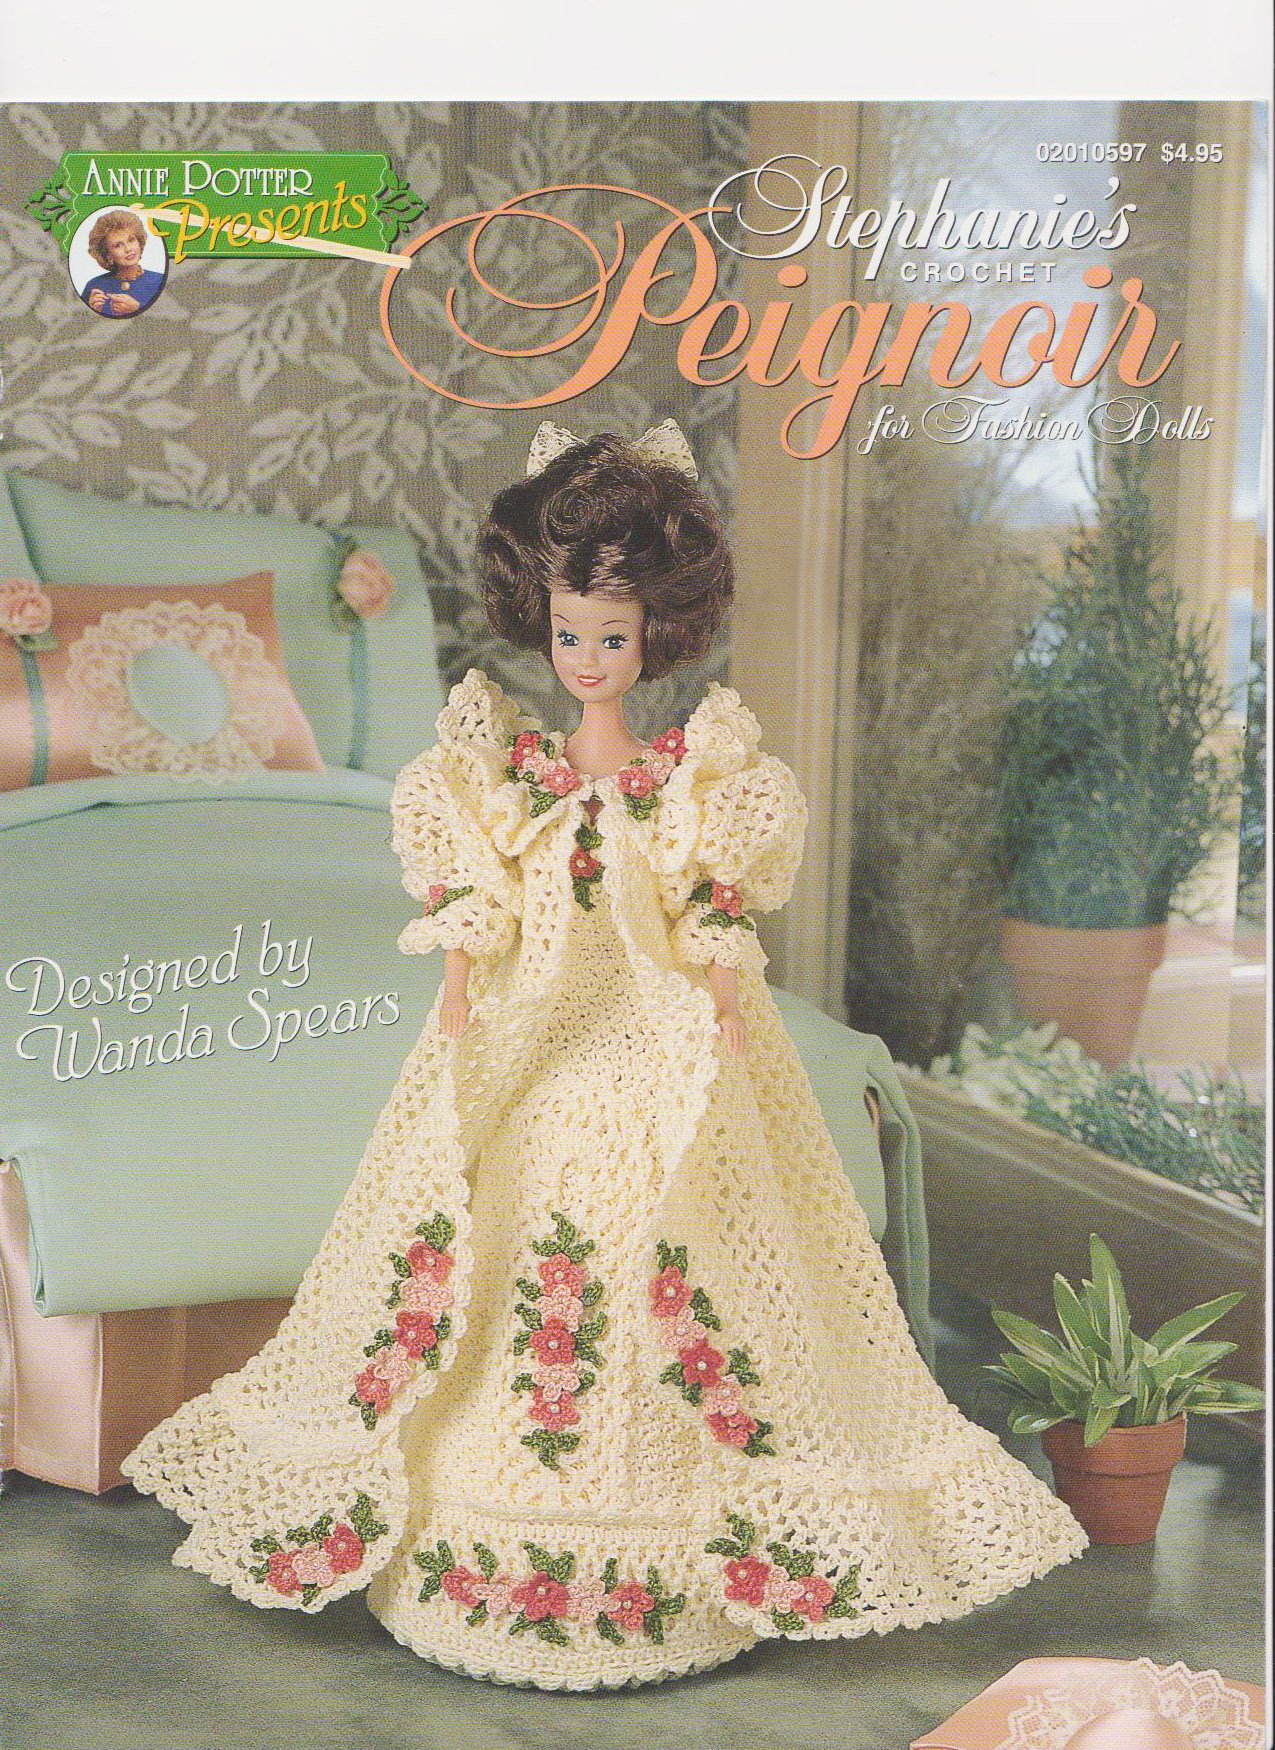 Annie Potter Presents Stephanies Crochet Peignoir For Fashion